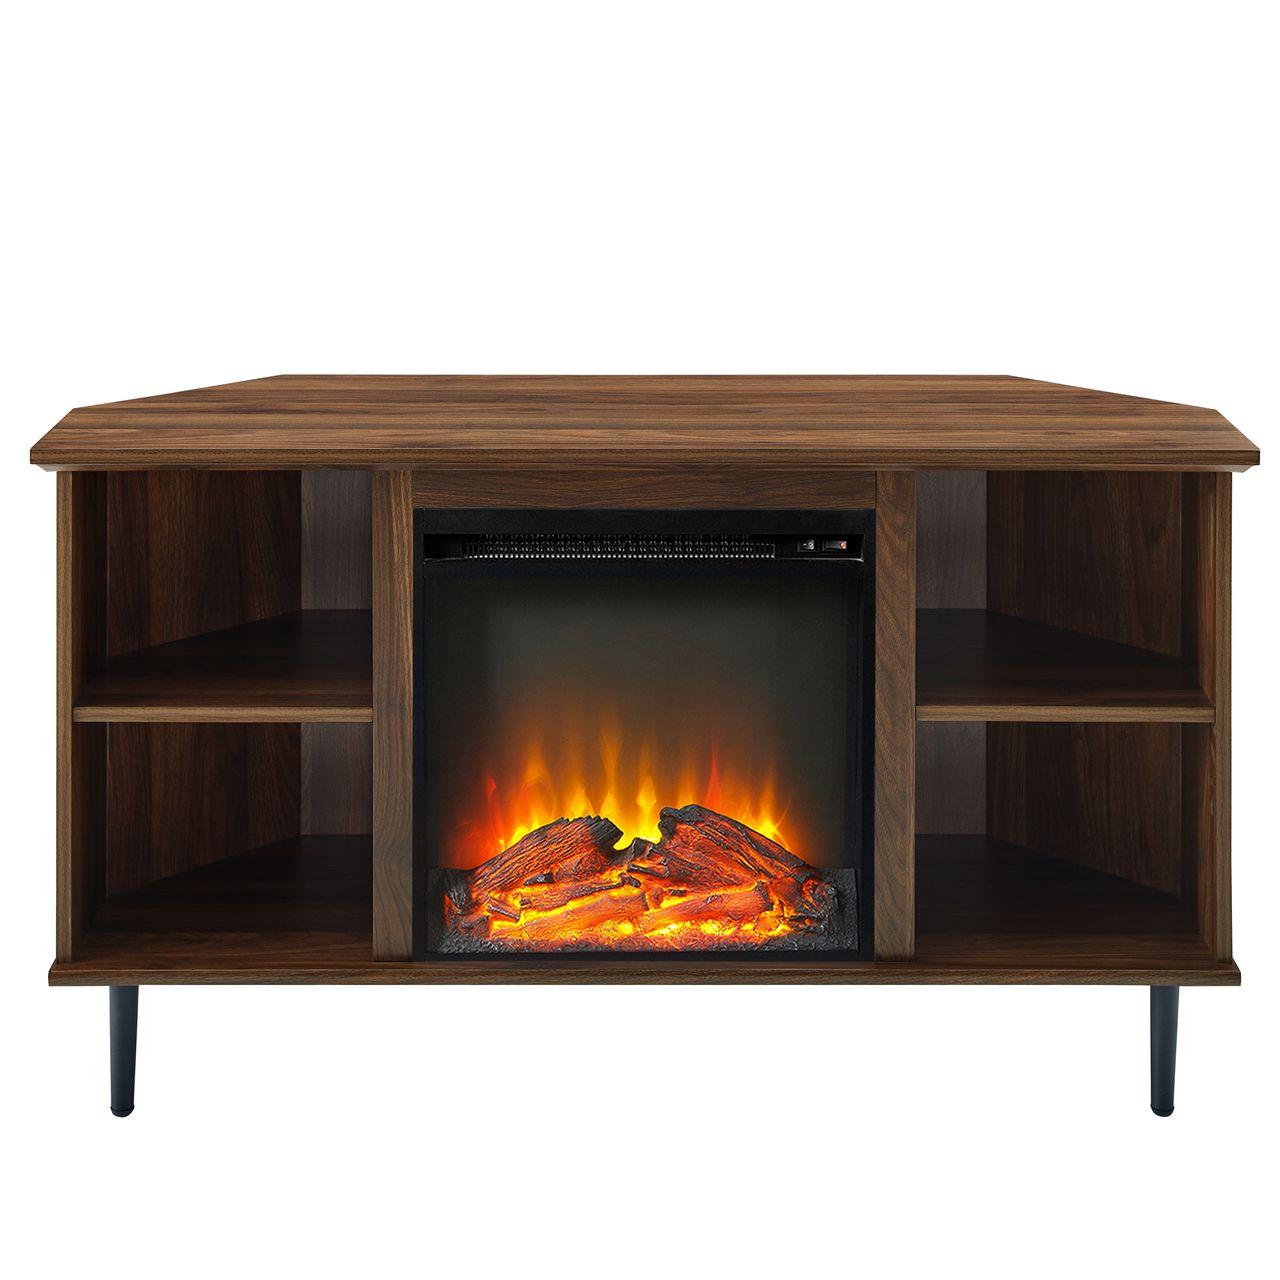 "Walker Edison Clyde 48"" Simple Corner Fireplace Console - Dark Walnut"